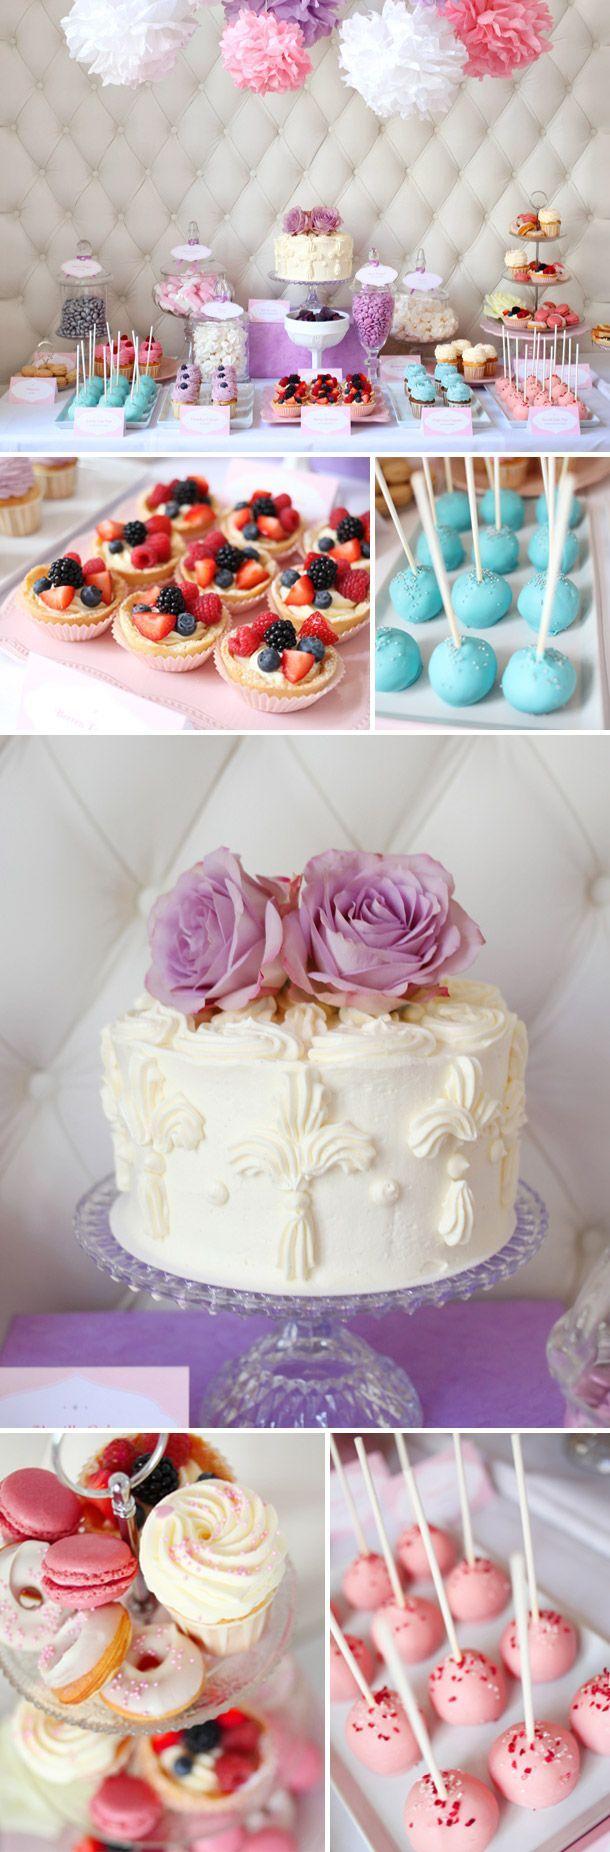 #dessertbars #cake #cupcakes #dessert